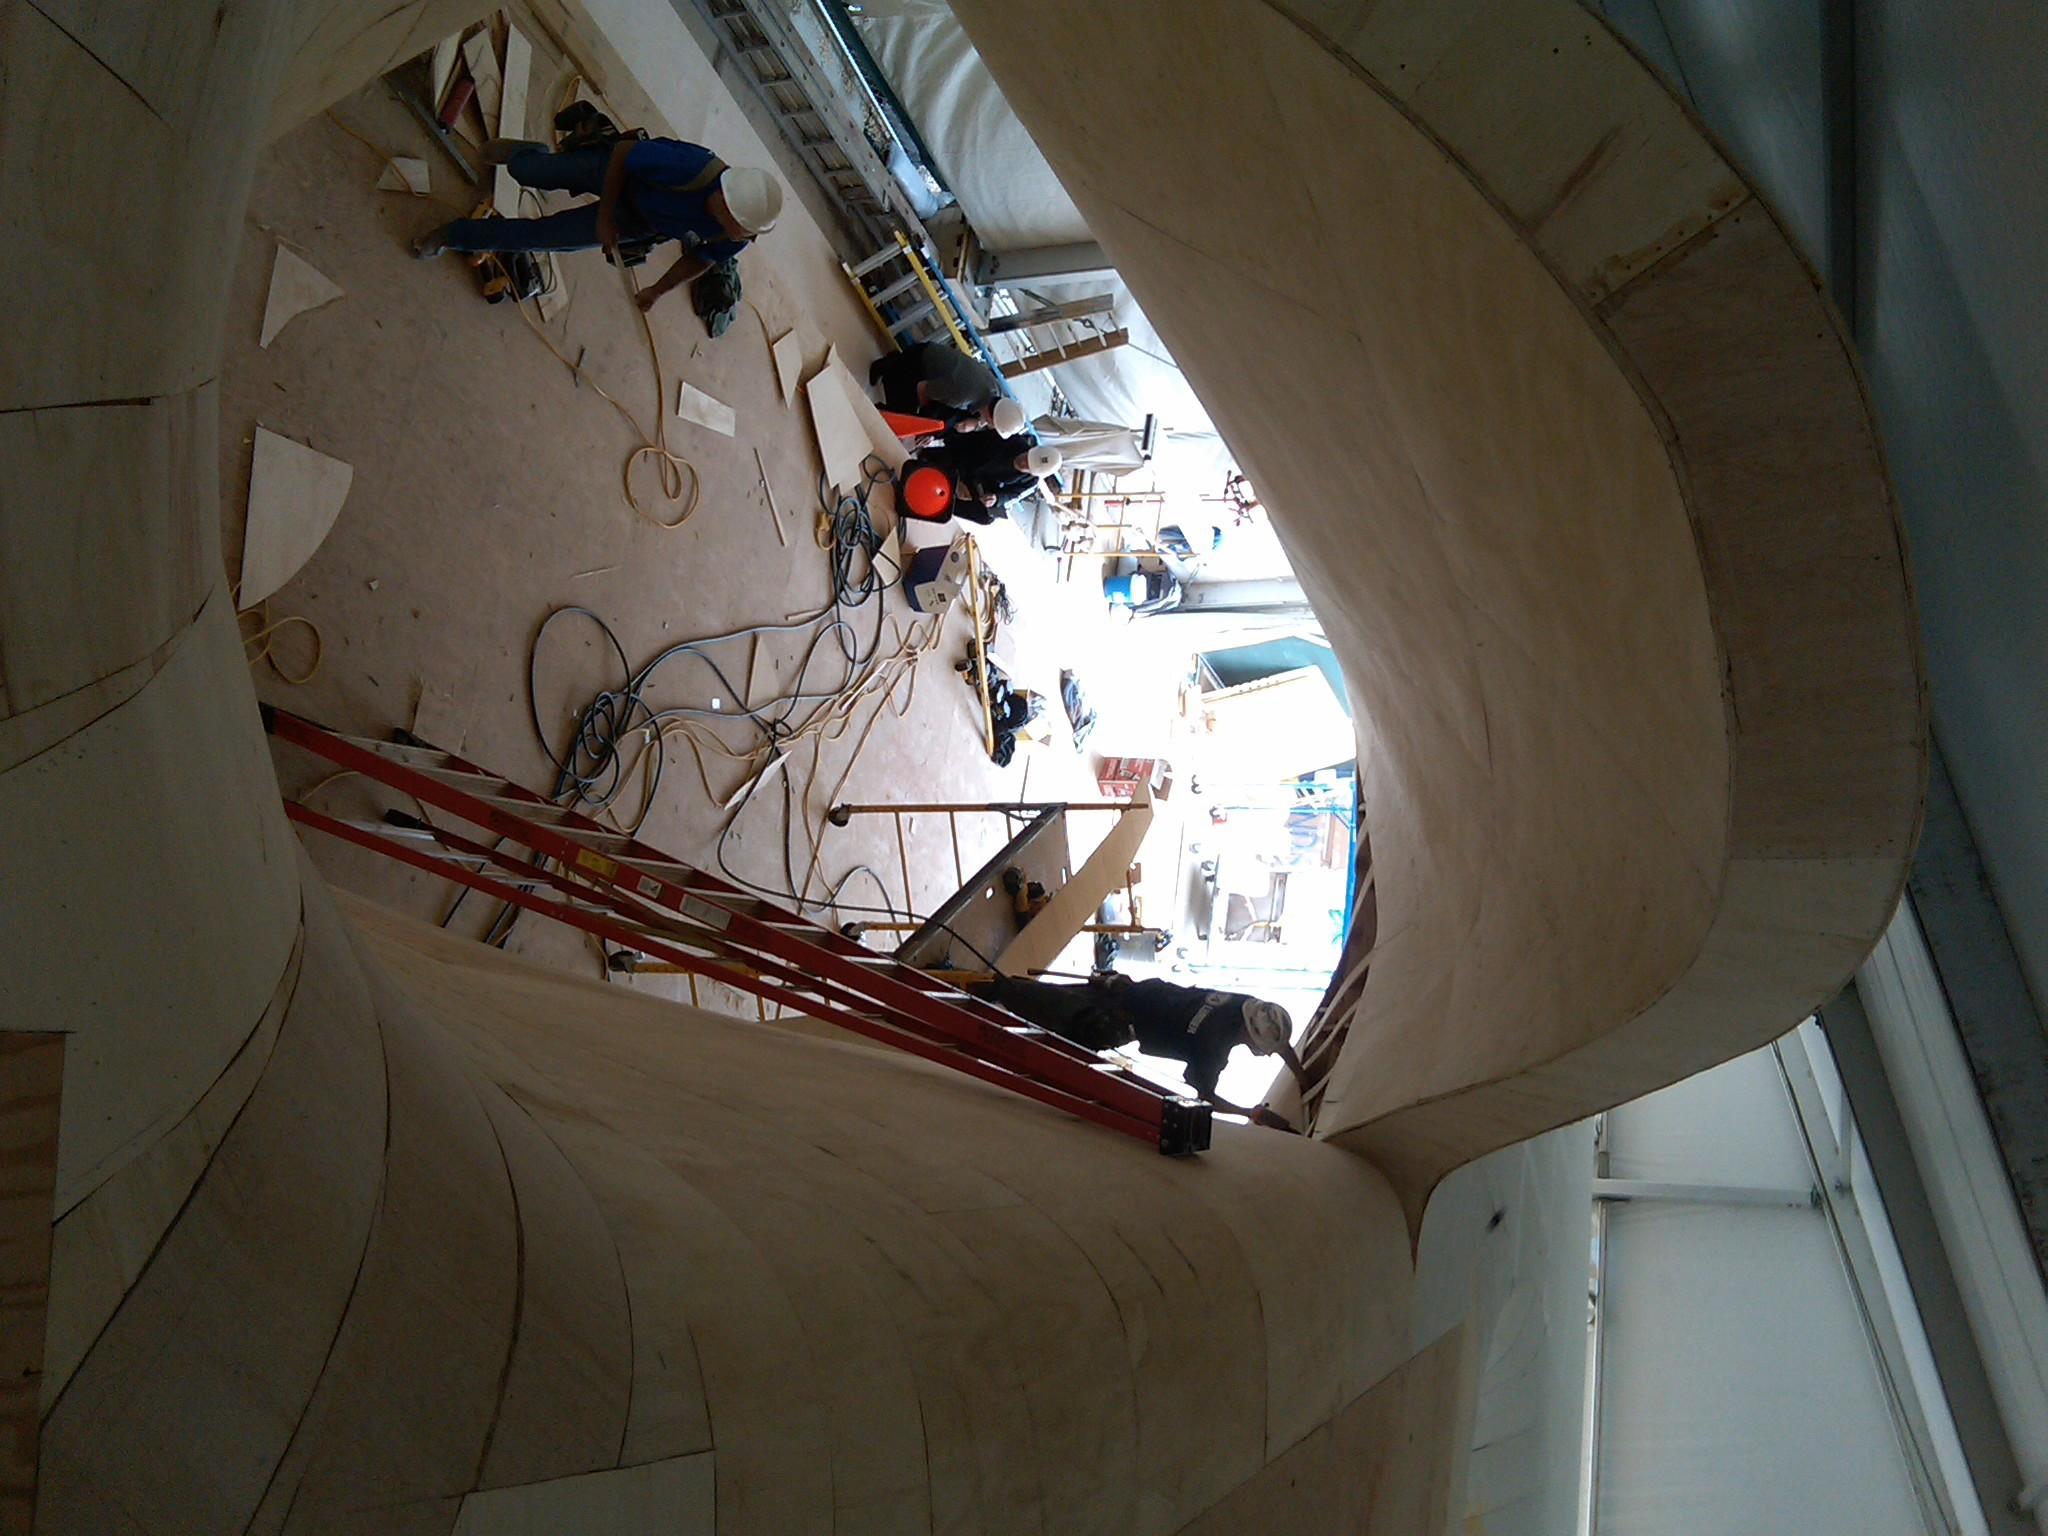 Structural Engineer - Rockey Structures  Design Architect - Ben van Berkel, UN Studio  Architect of Record - Garofalo Architects  Chicago Art Installation